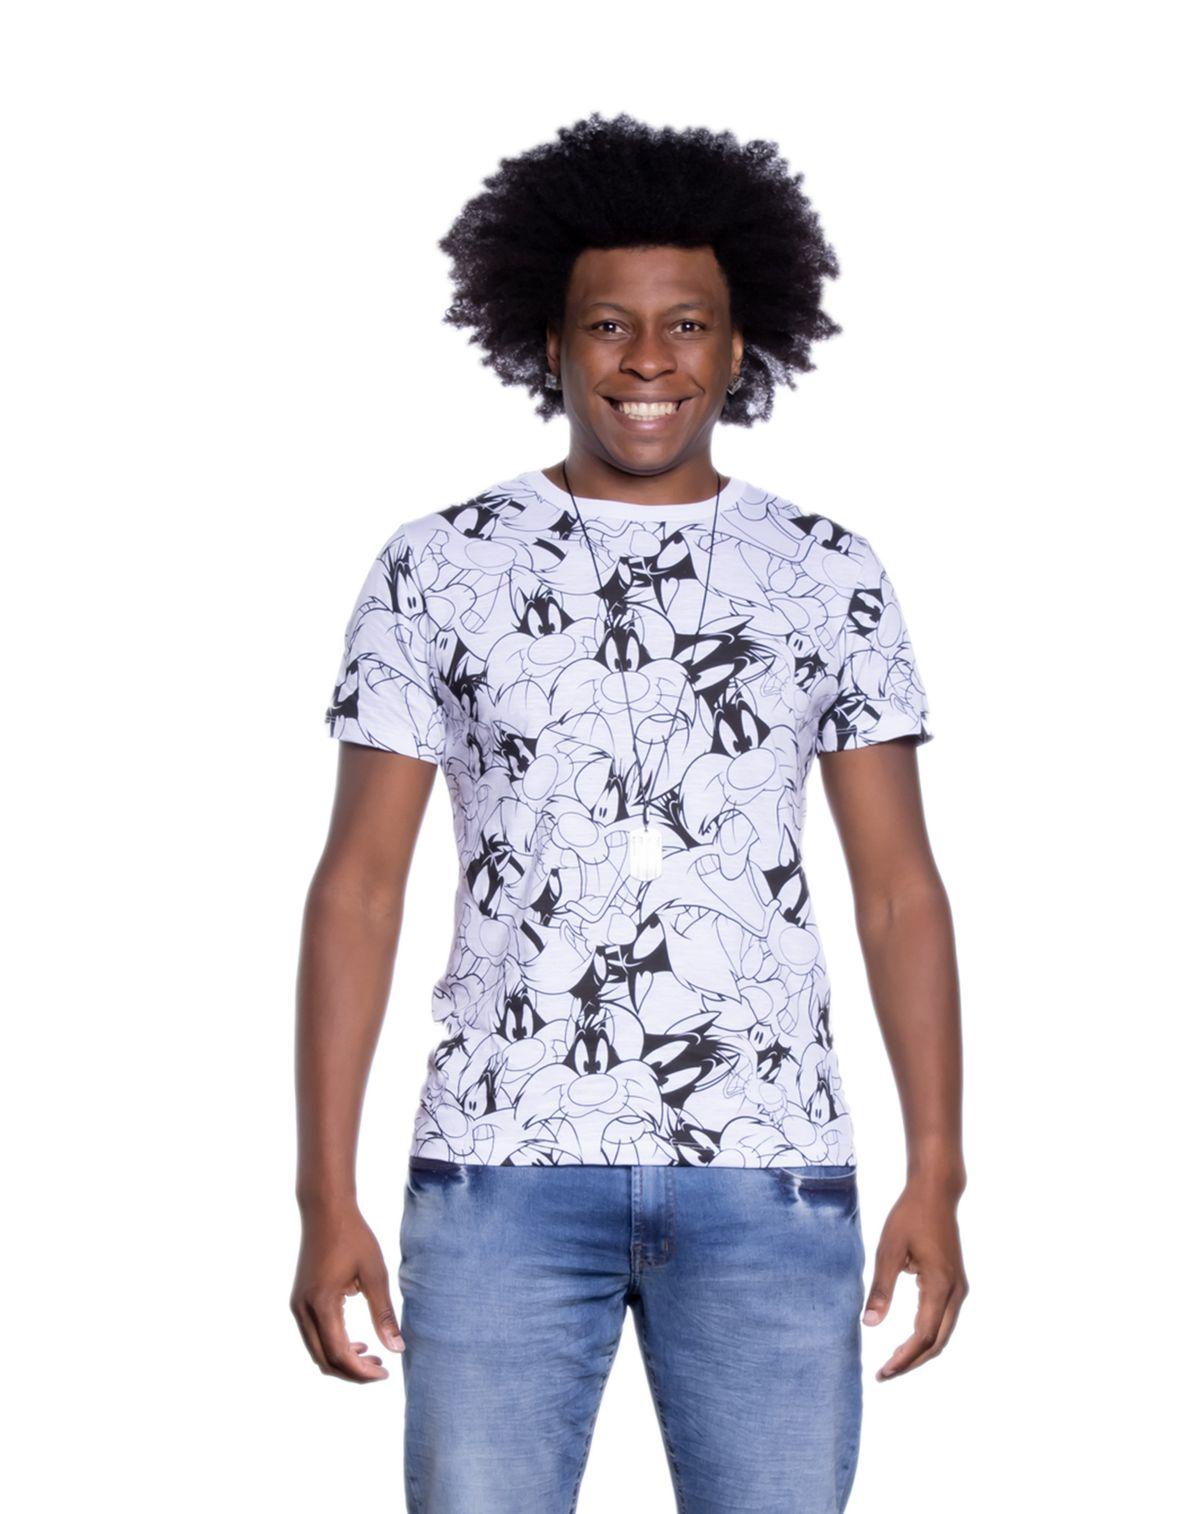 588455003-camiseta-manga-curta-masculina-frajola-looney-tunes-branco-g-1ab